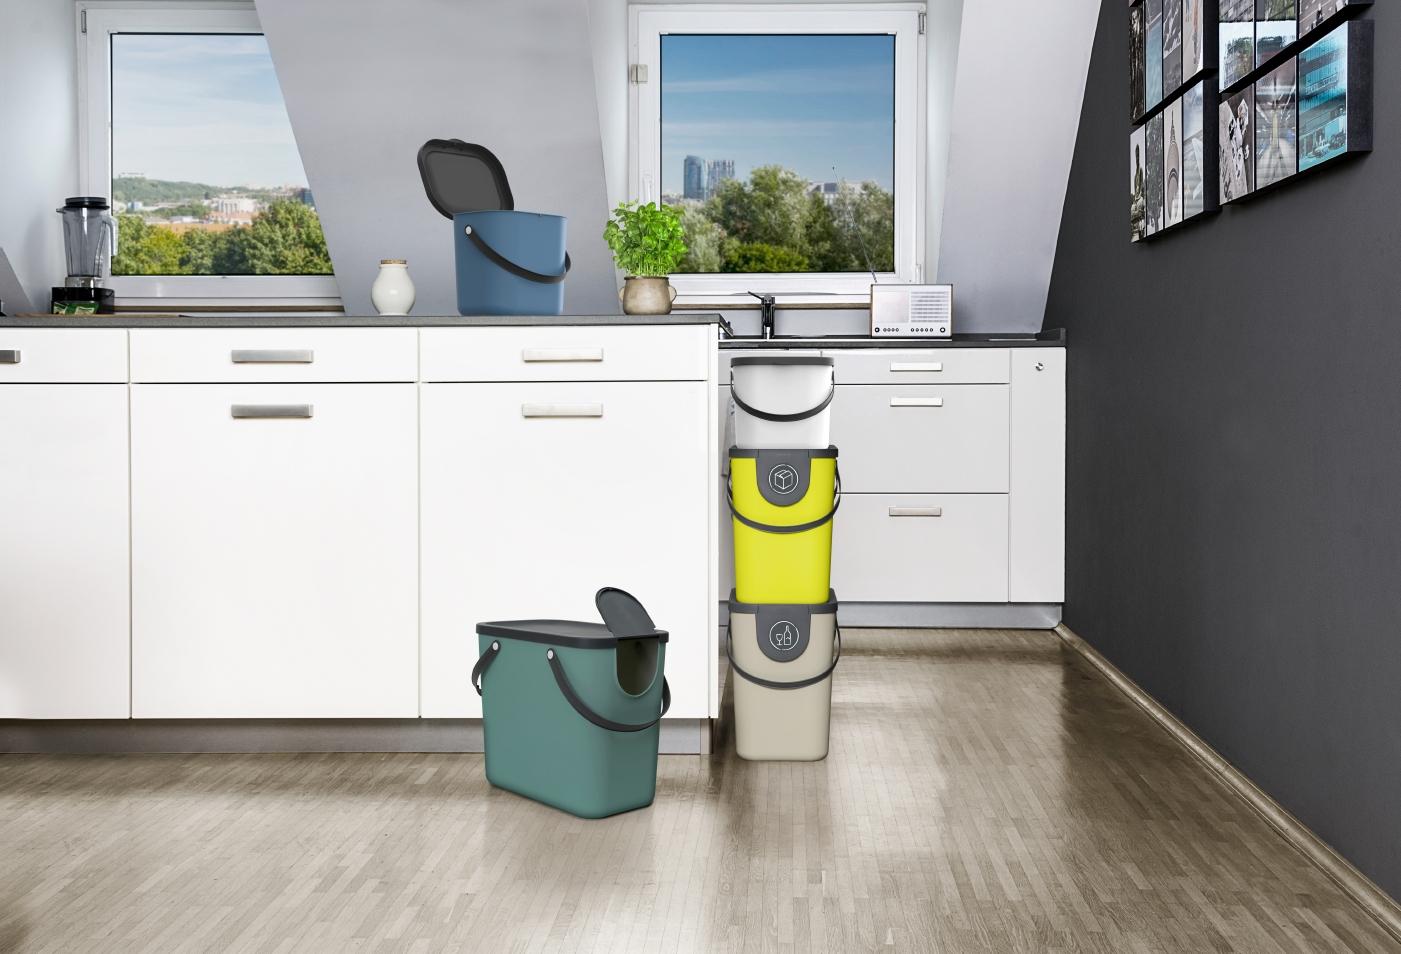 Full Size of Recycling Mllsystem Albula 6 L Horizon Blue Jetzt Müllsystem Küche Wohnzimmer Müllsystem